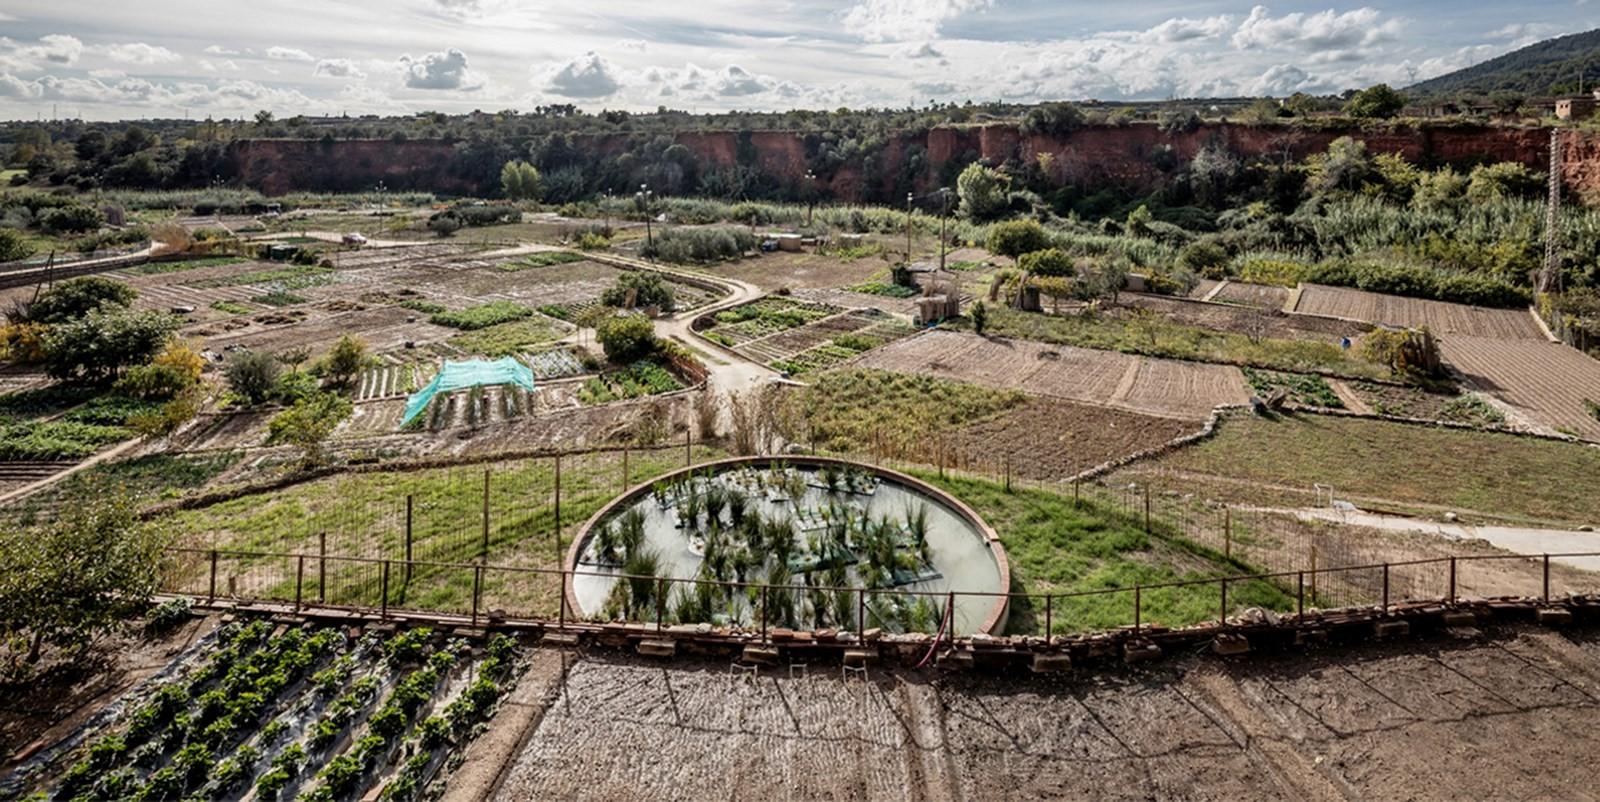 Thermal Orchards, Caldes de Montbui, Spain - Sheet1